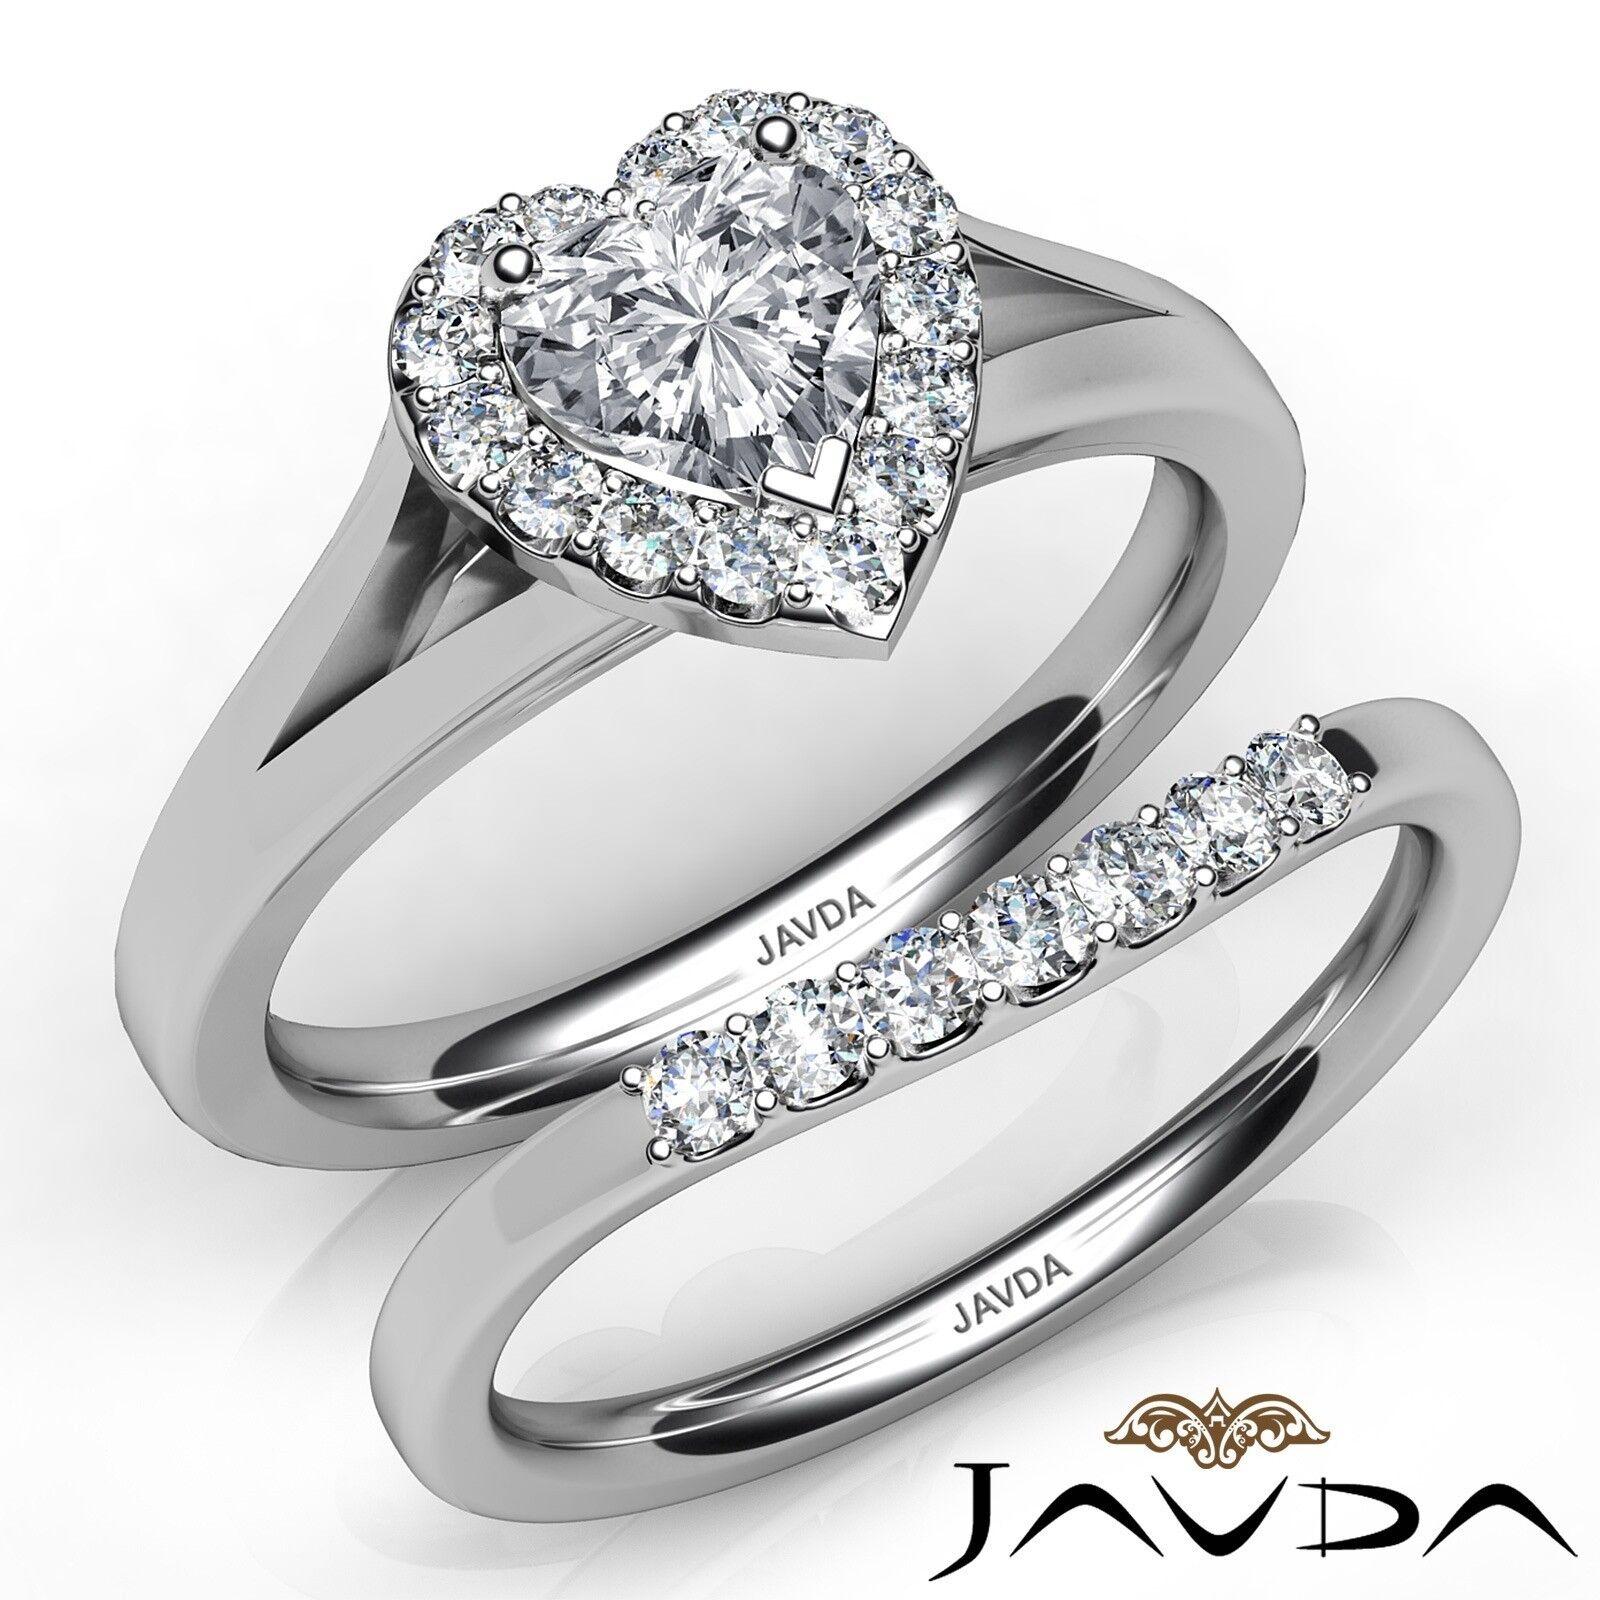 1.22ctw Pave Halo Bridal Set Heart Diamond Engagement Ring GIA F-VVS1 White Gold